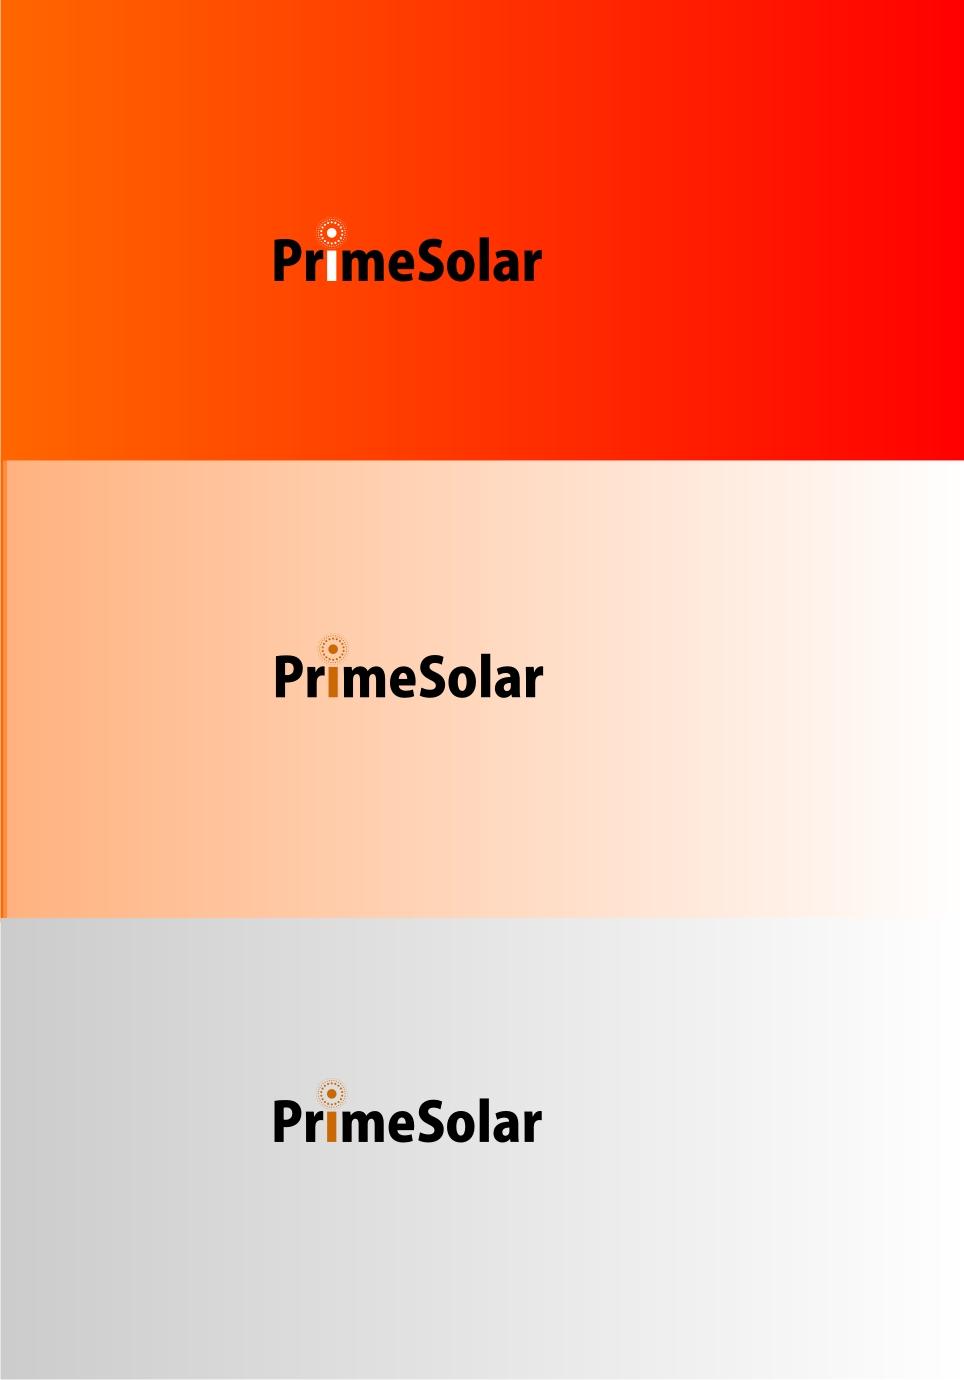 Логотип компании PrimeSolar [UPD: 16:45 15/12/11] фото f_4ef30b6455615.jpg